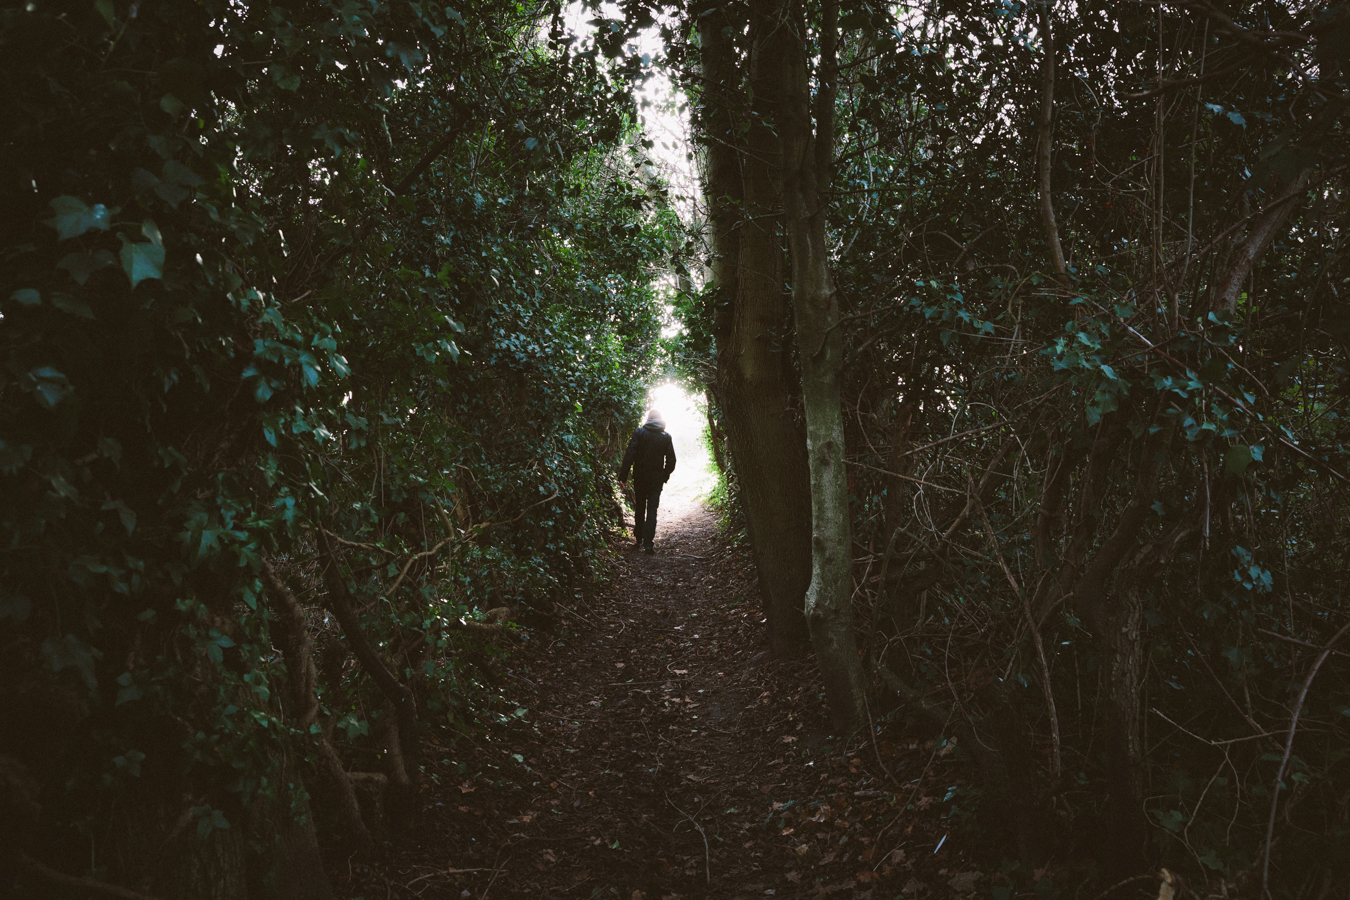 Heading through to the meadow, Great Malvern